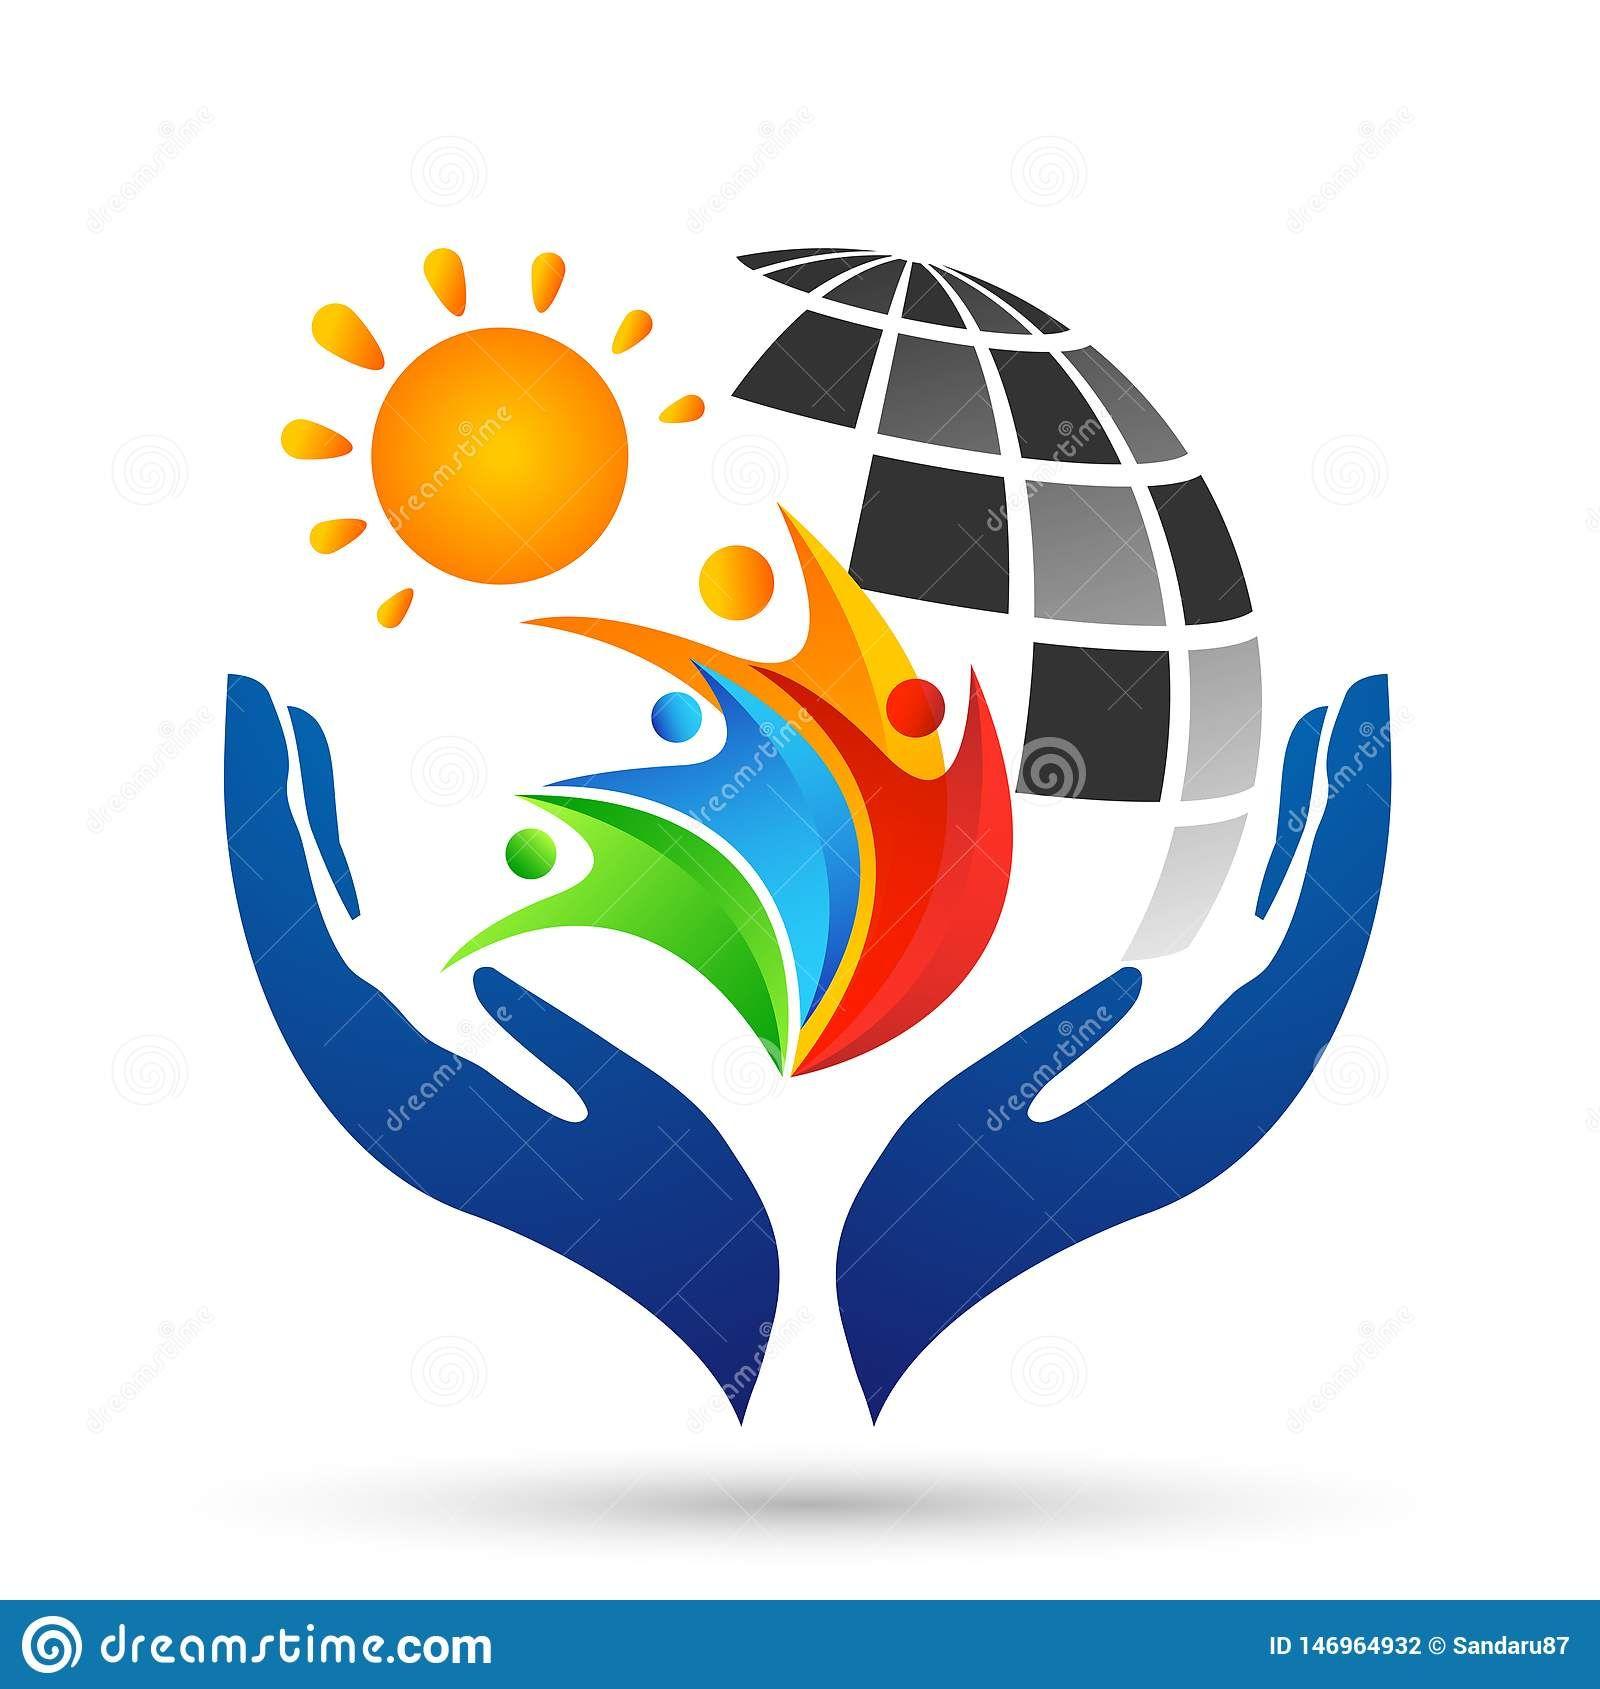 Globe save world sun People care Hands taking care people